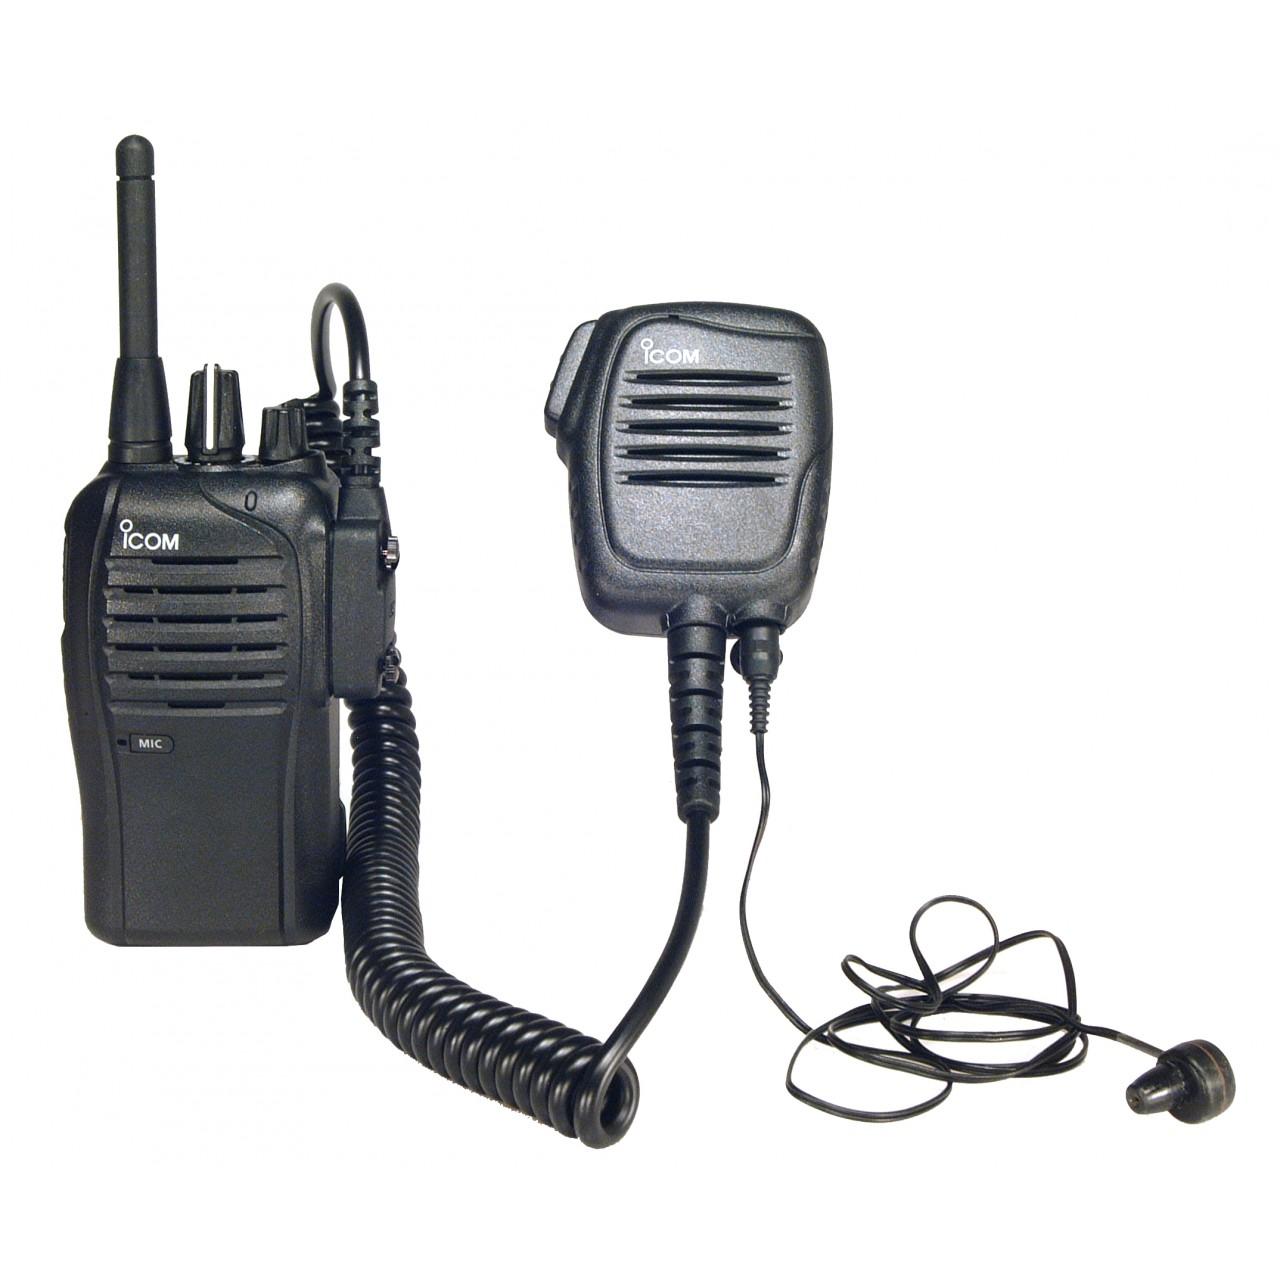 HM-159LA Microphones - ICOM